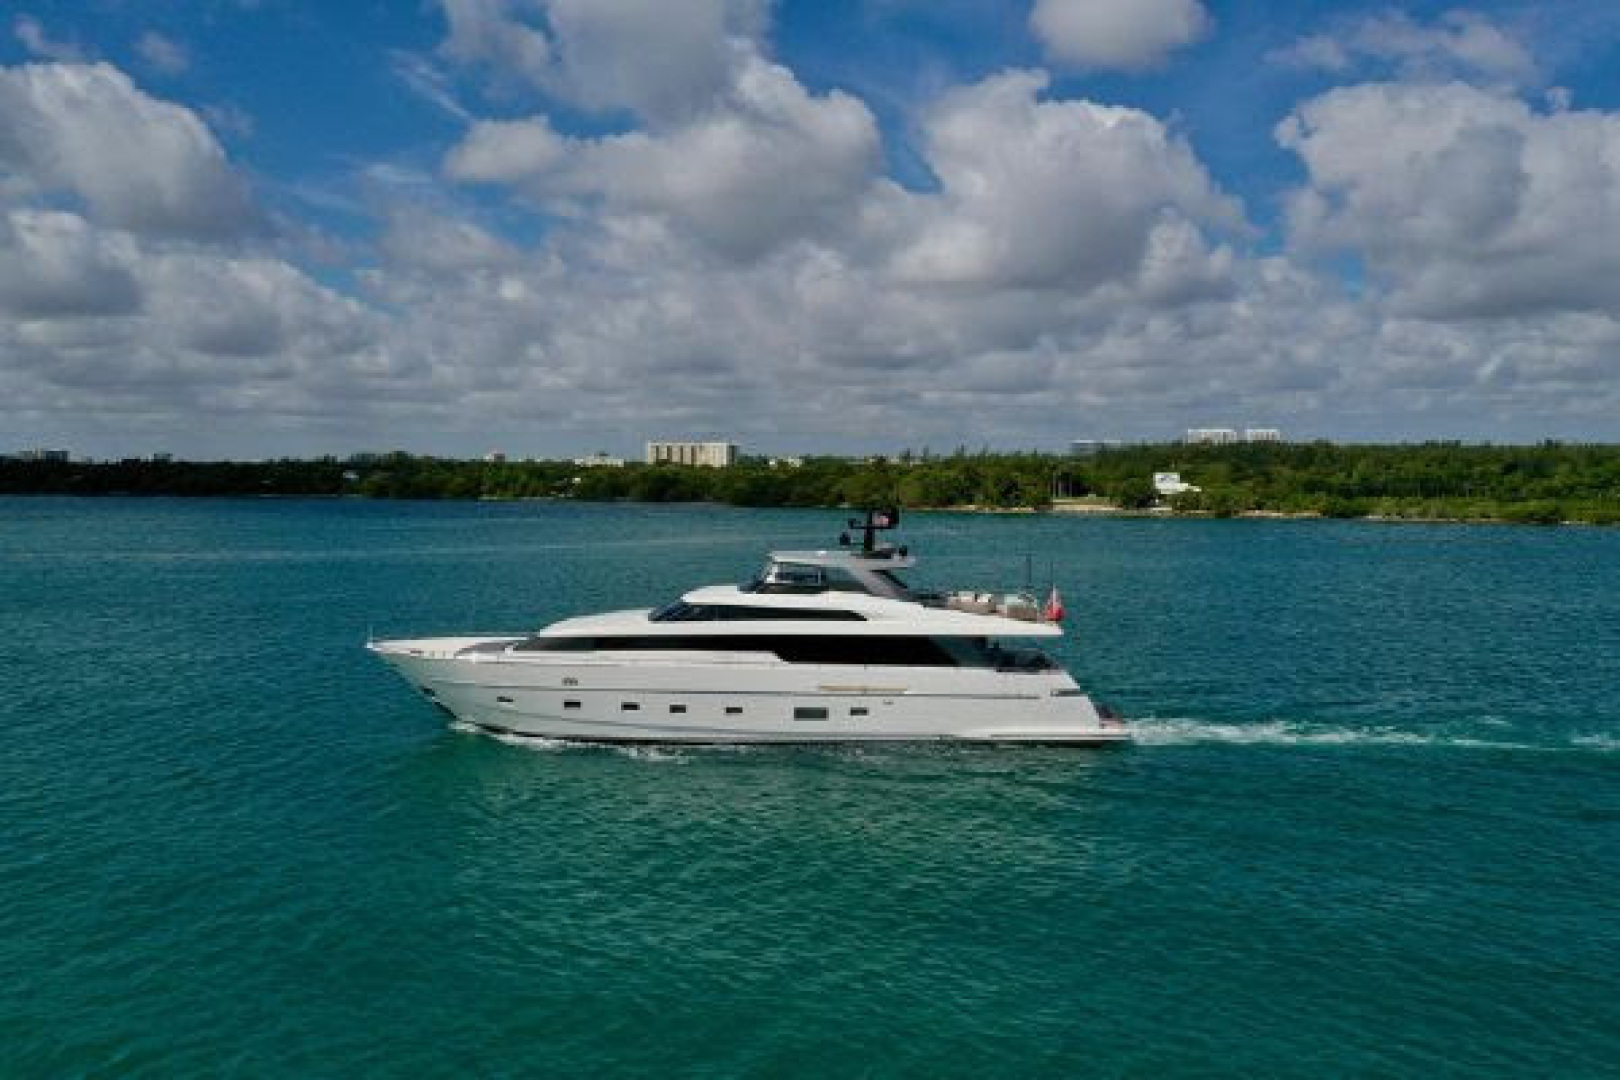 Sanlorenzo-SL94 2012-Sanlorenzo SL94 Aventura-Florida-United States-1637122 | Thumbnail